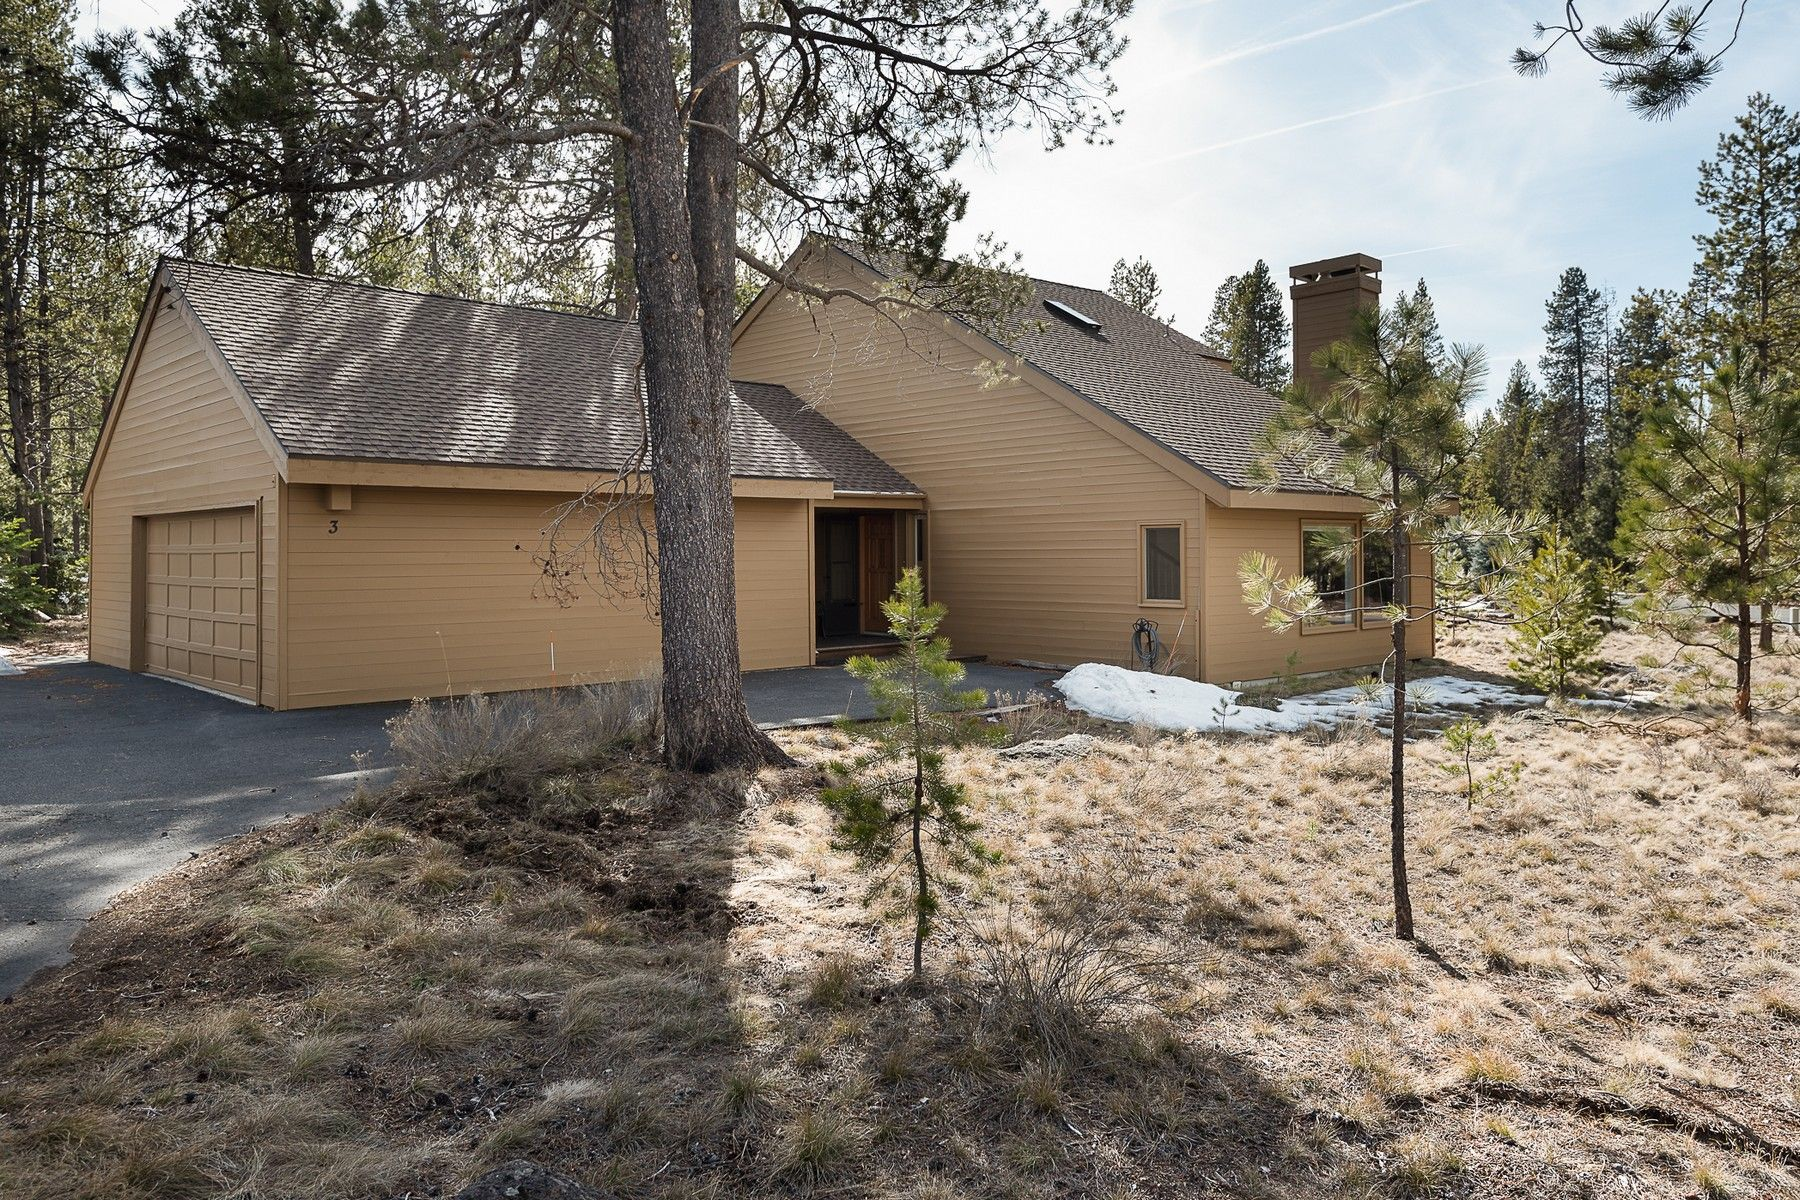 Other Residential Homes για την Πώληση στο 17711 Plover Lane 3 Sunriver, OR 97707 Sunriver, Ορεγκον 97707 Ηνωμένες Πολιτείες